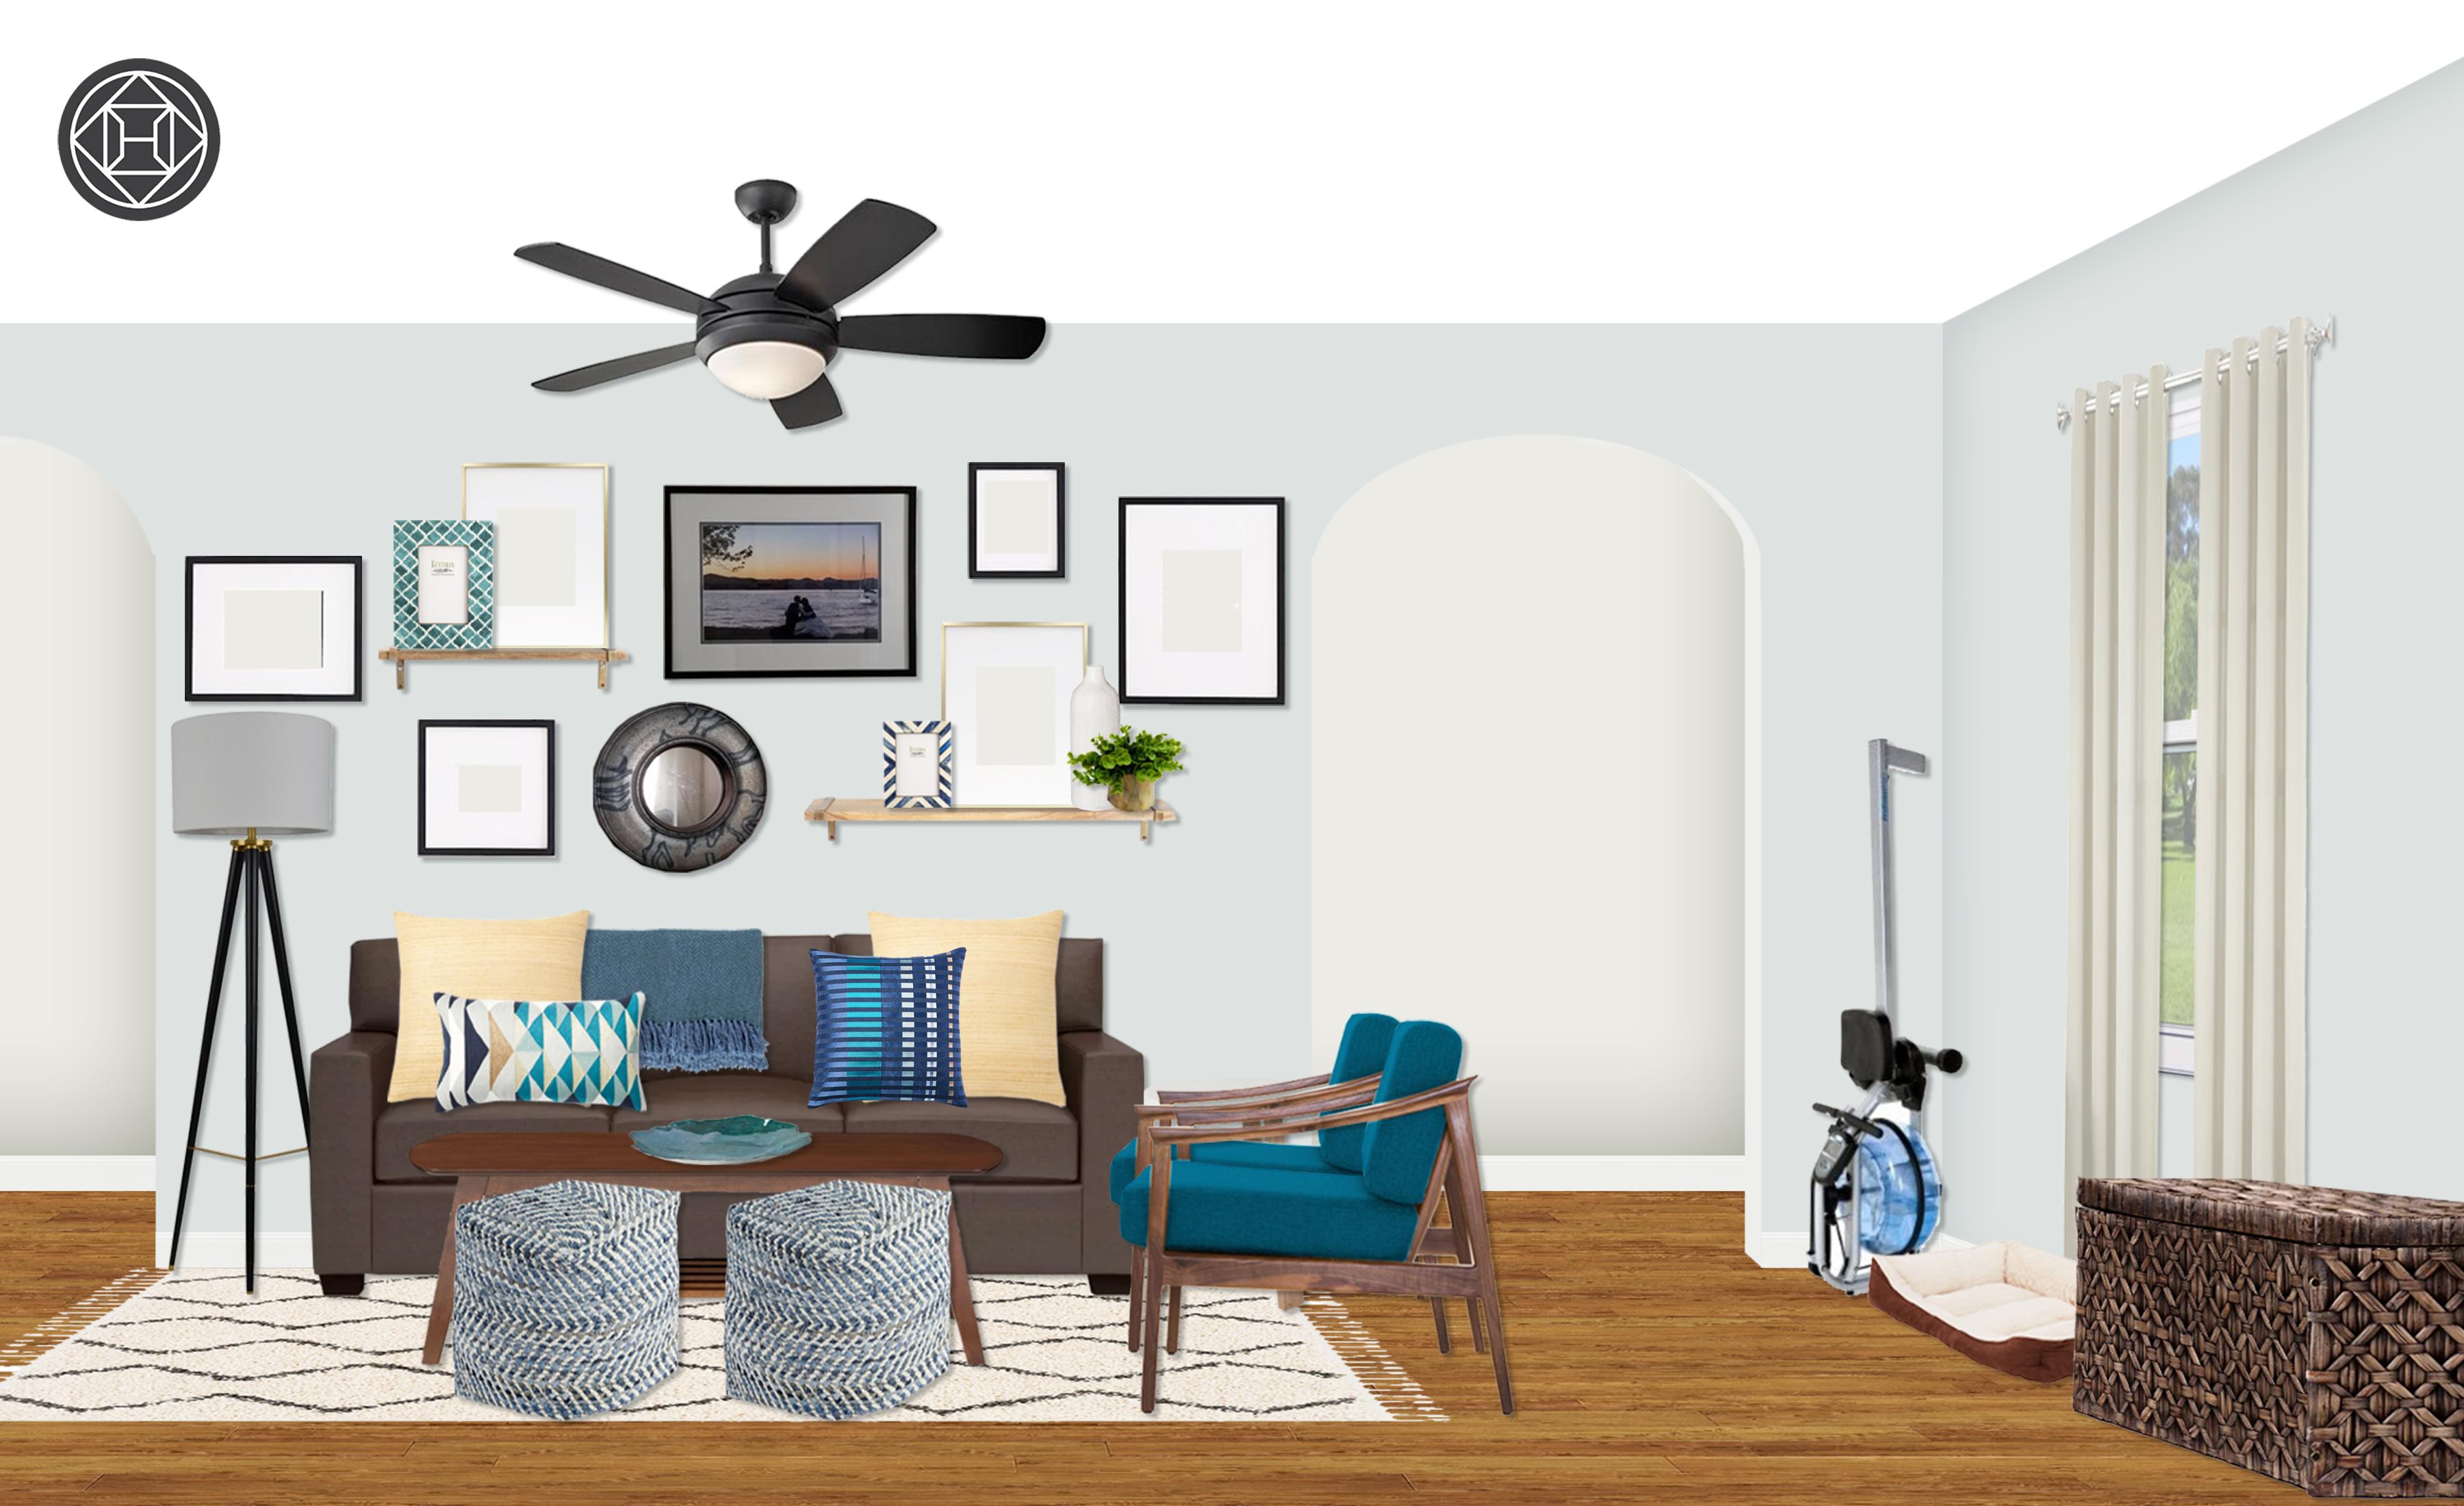 houston doors and nyc interior jobs decorator angles area designer rugs denver design salary target more theorem